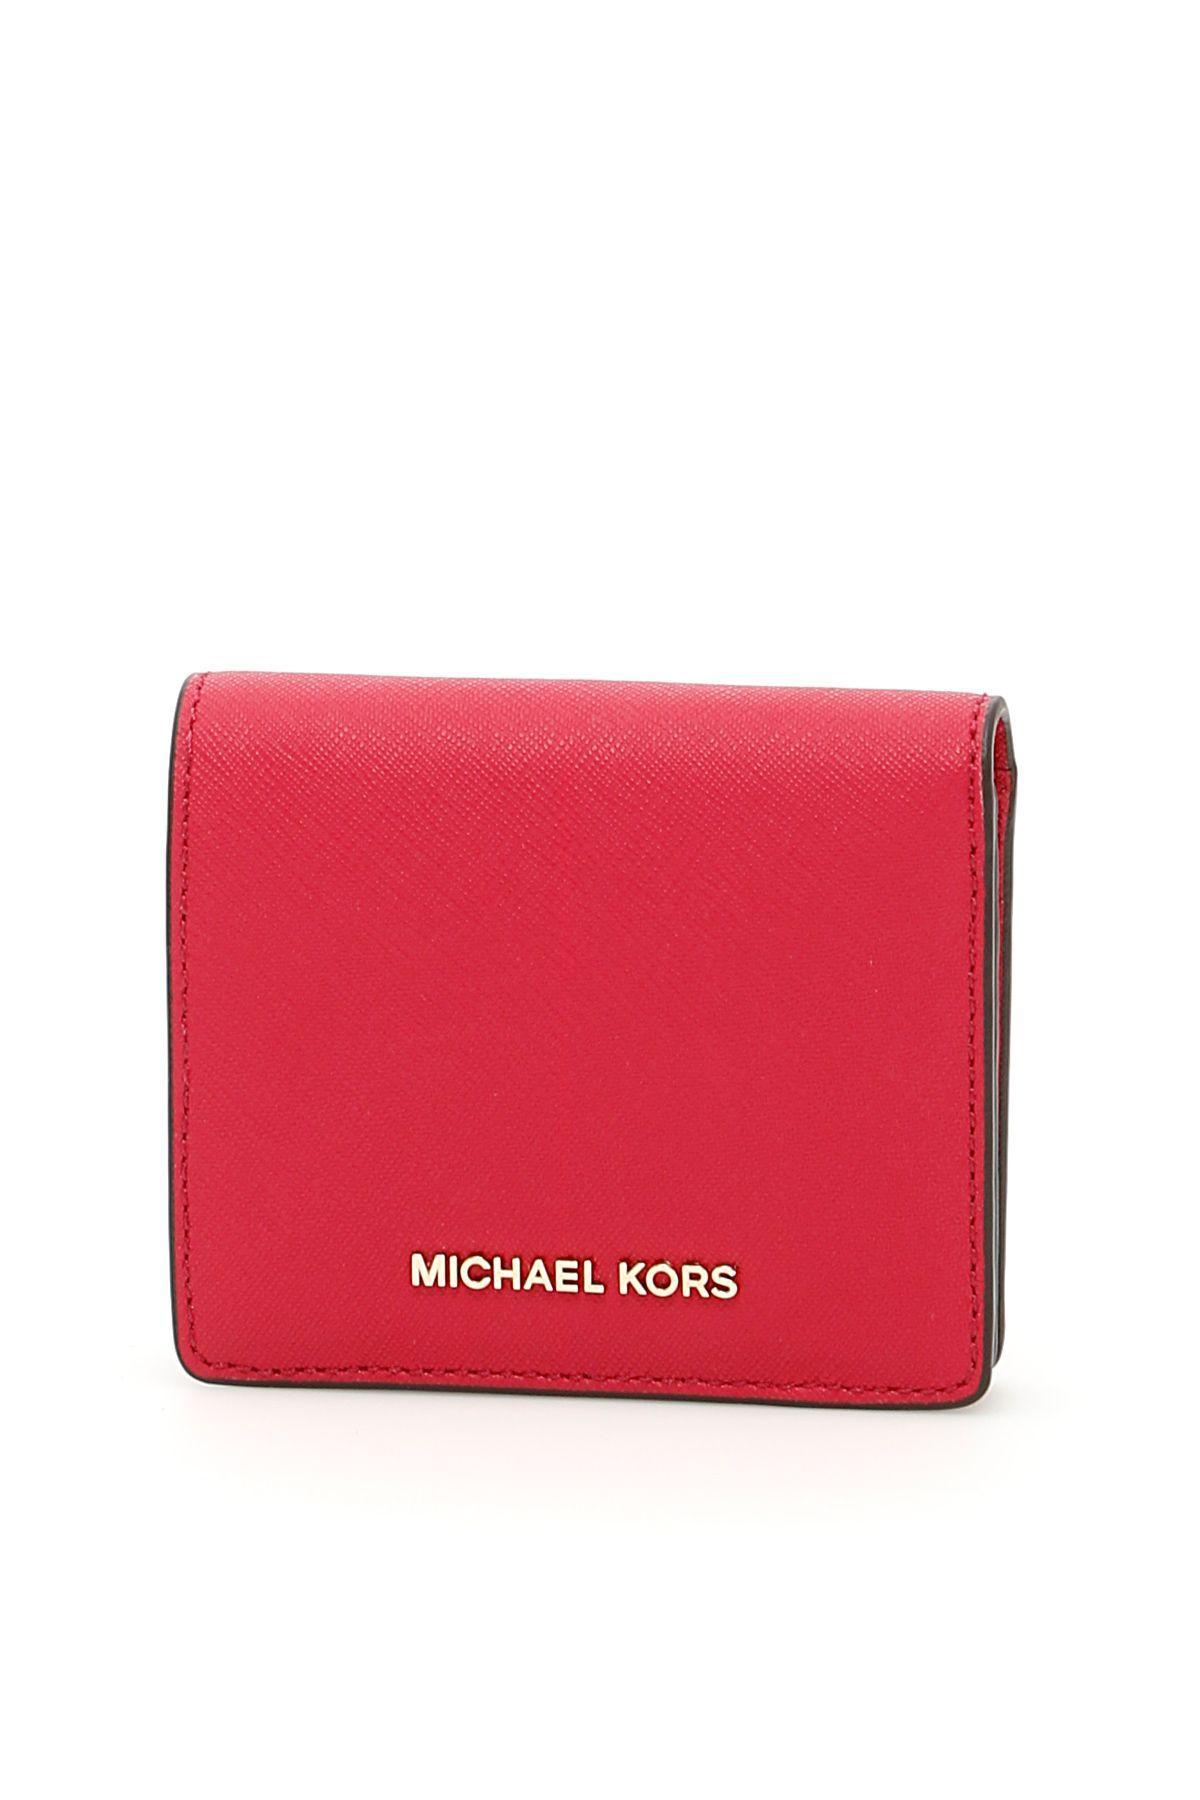 Michael Michael Kors Jet Set Travel Cardholder In Cranberryviola